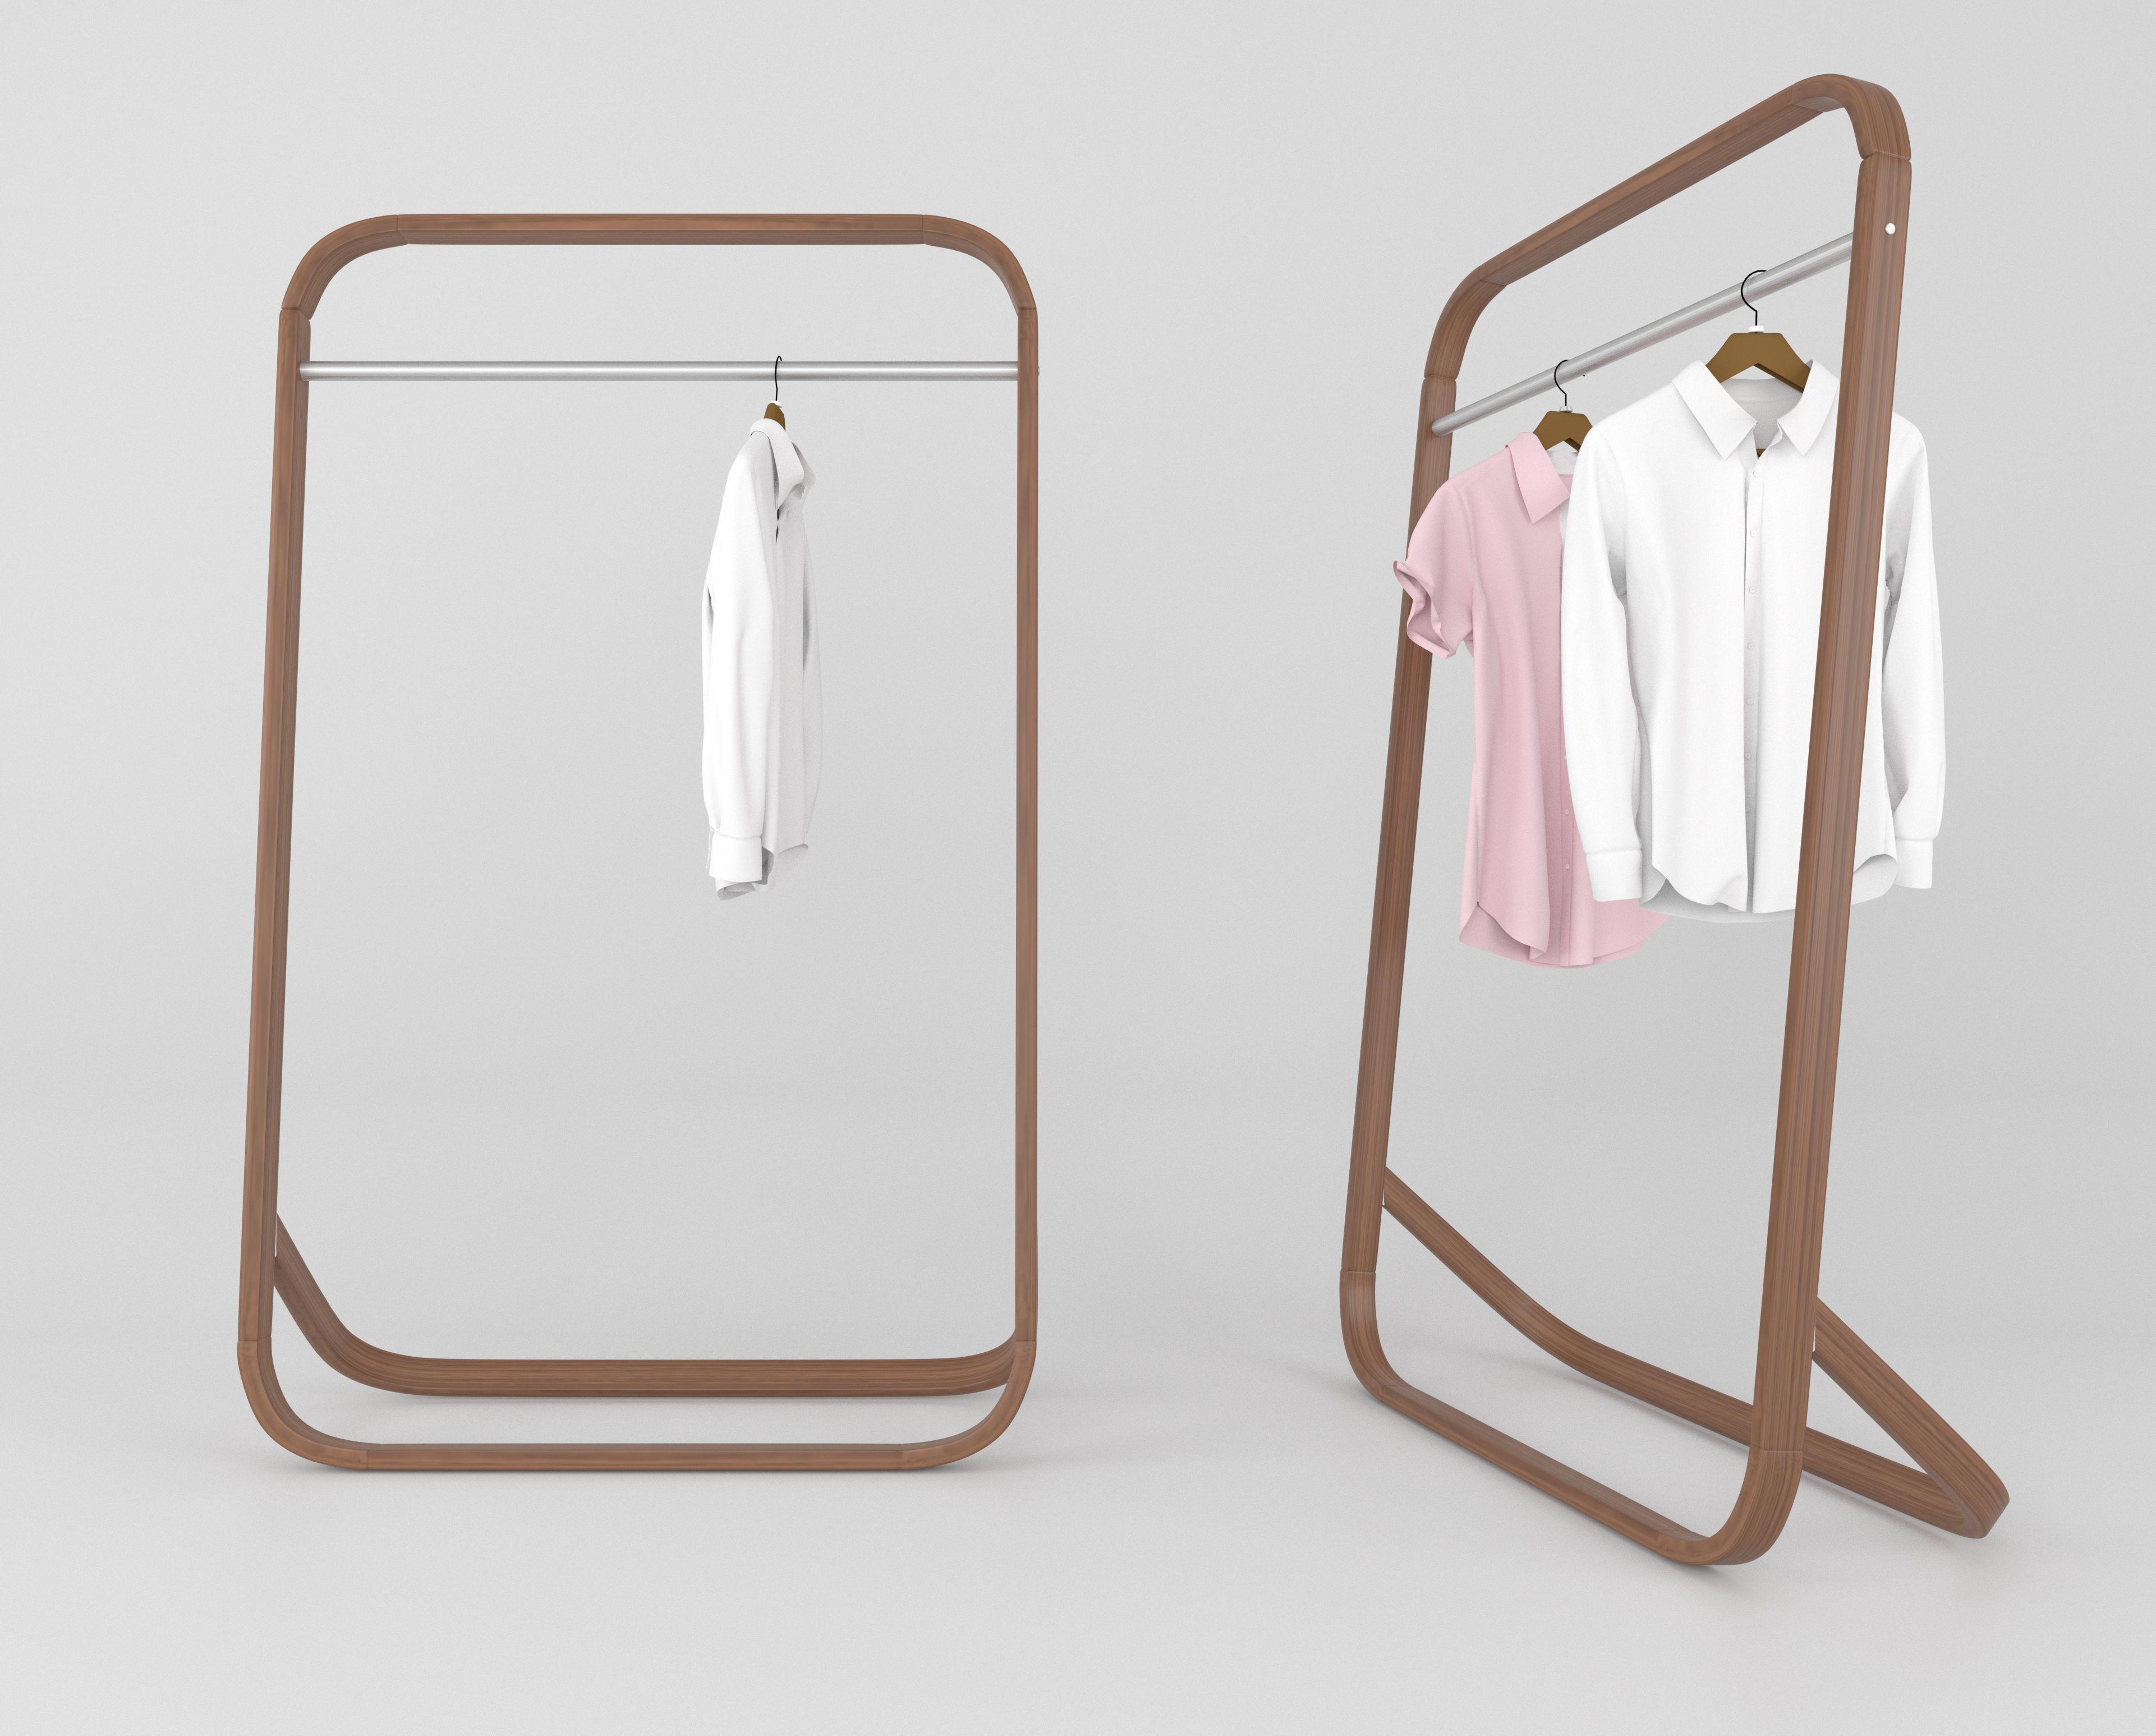 organisation rack uk co clothes pdp pro storage space wayfair reviews metal aura